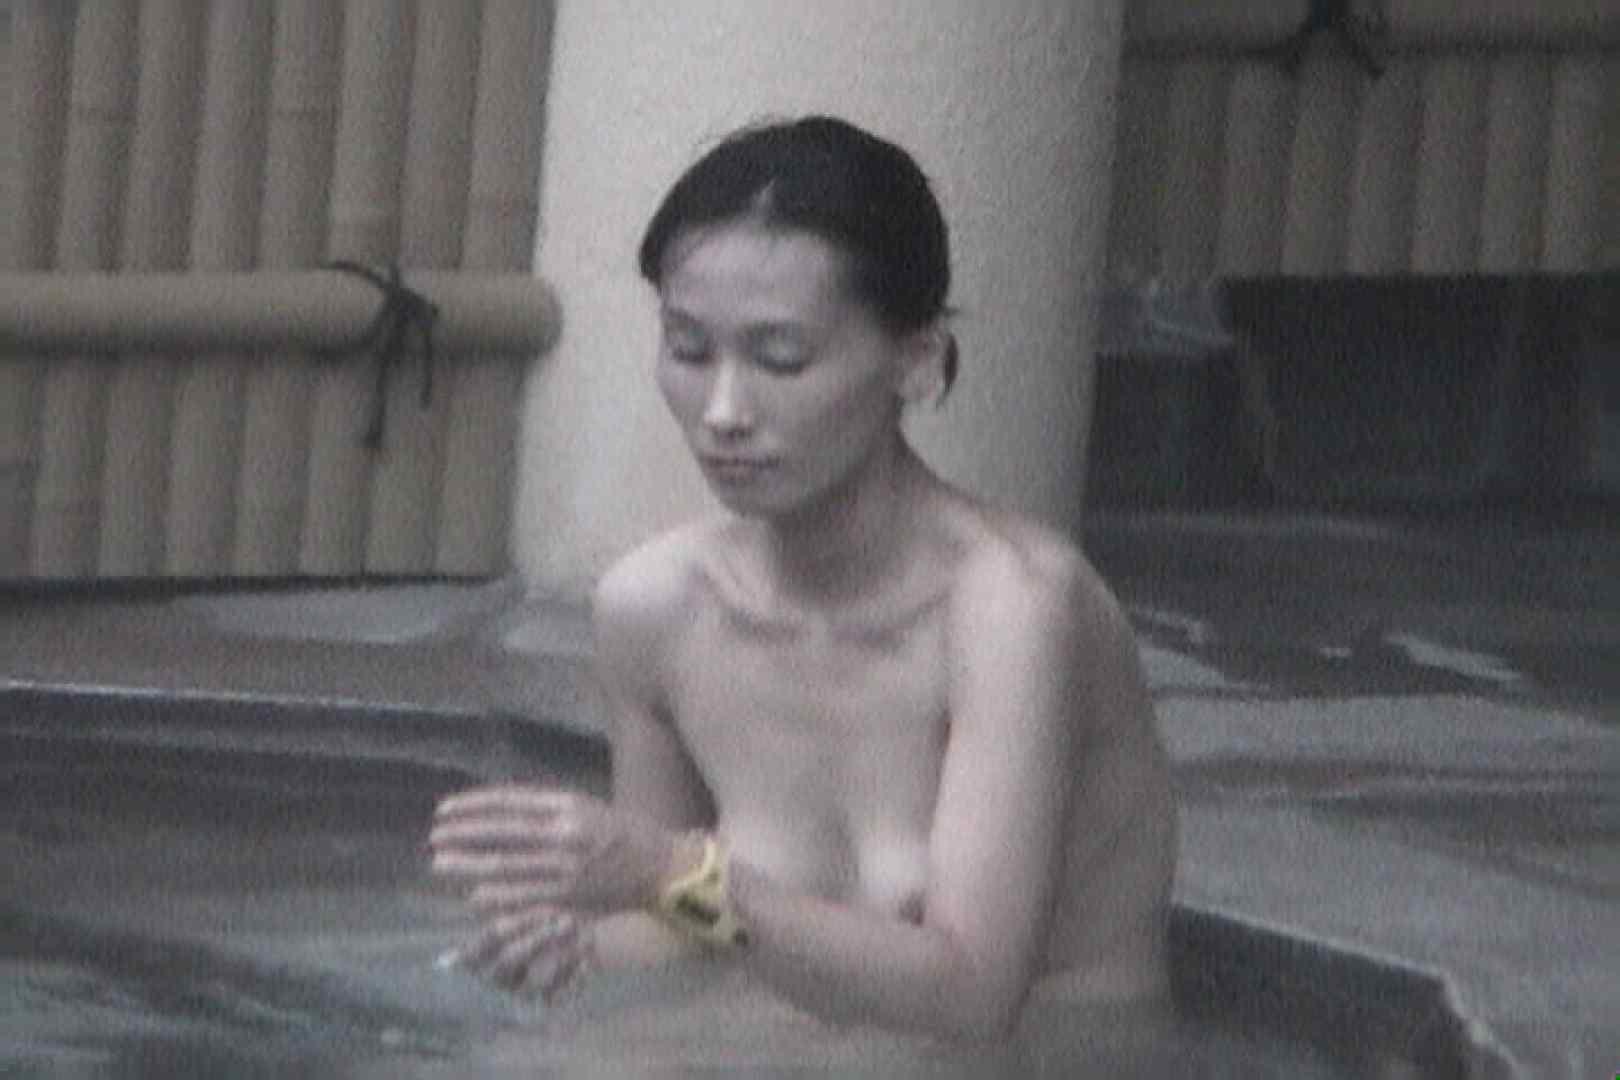 Aquaな露天風呂Vol.557 露天風呂編  100PIX 10